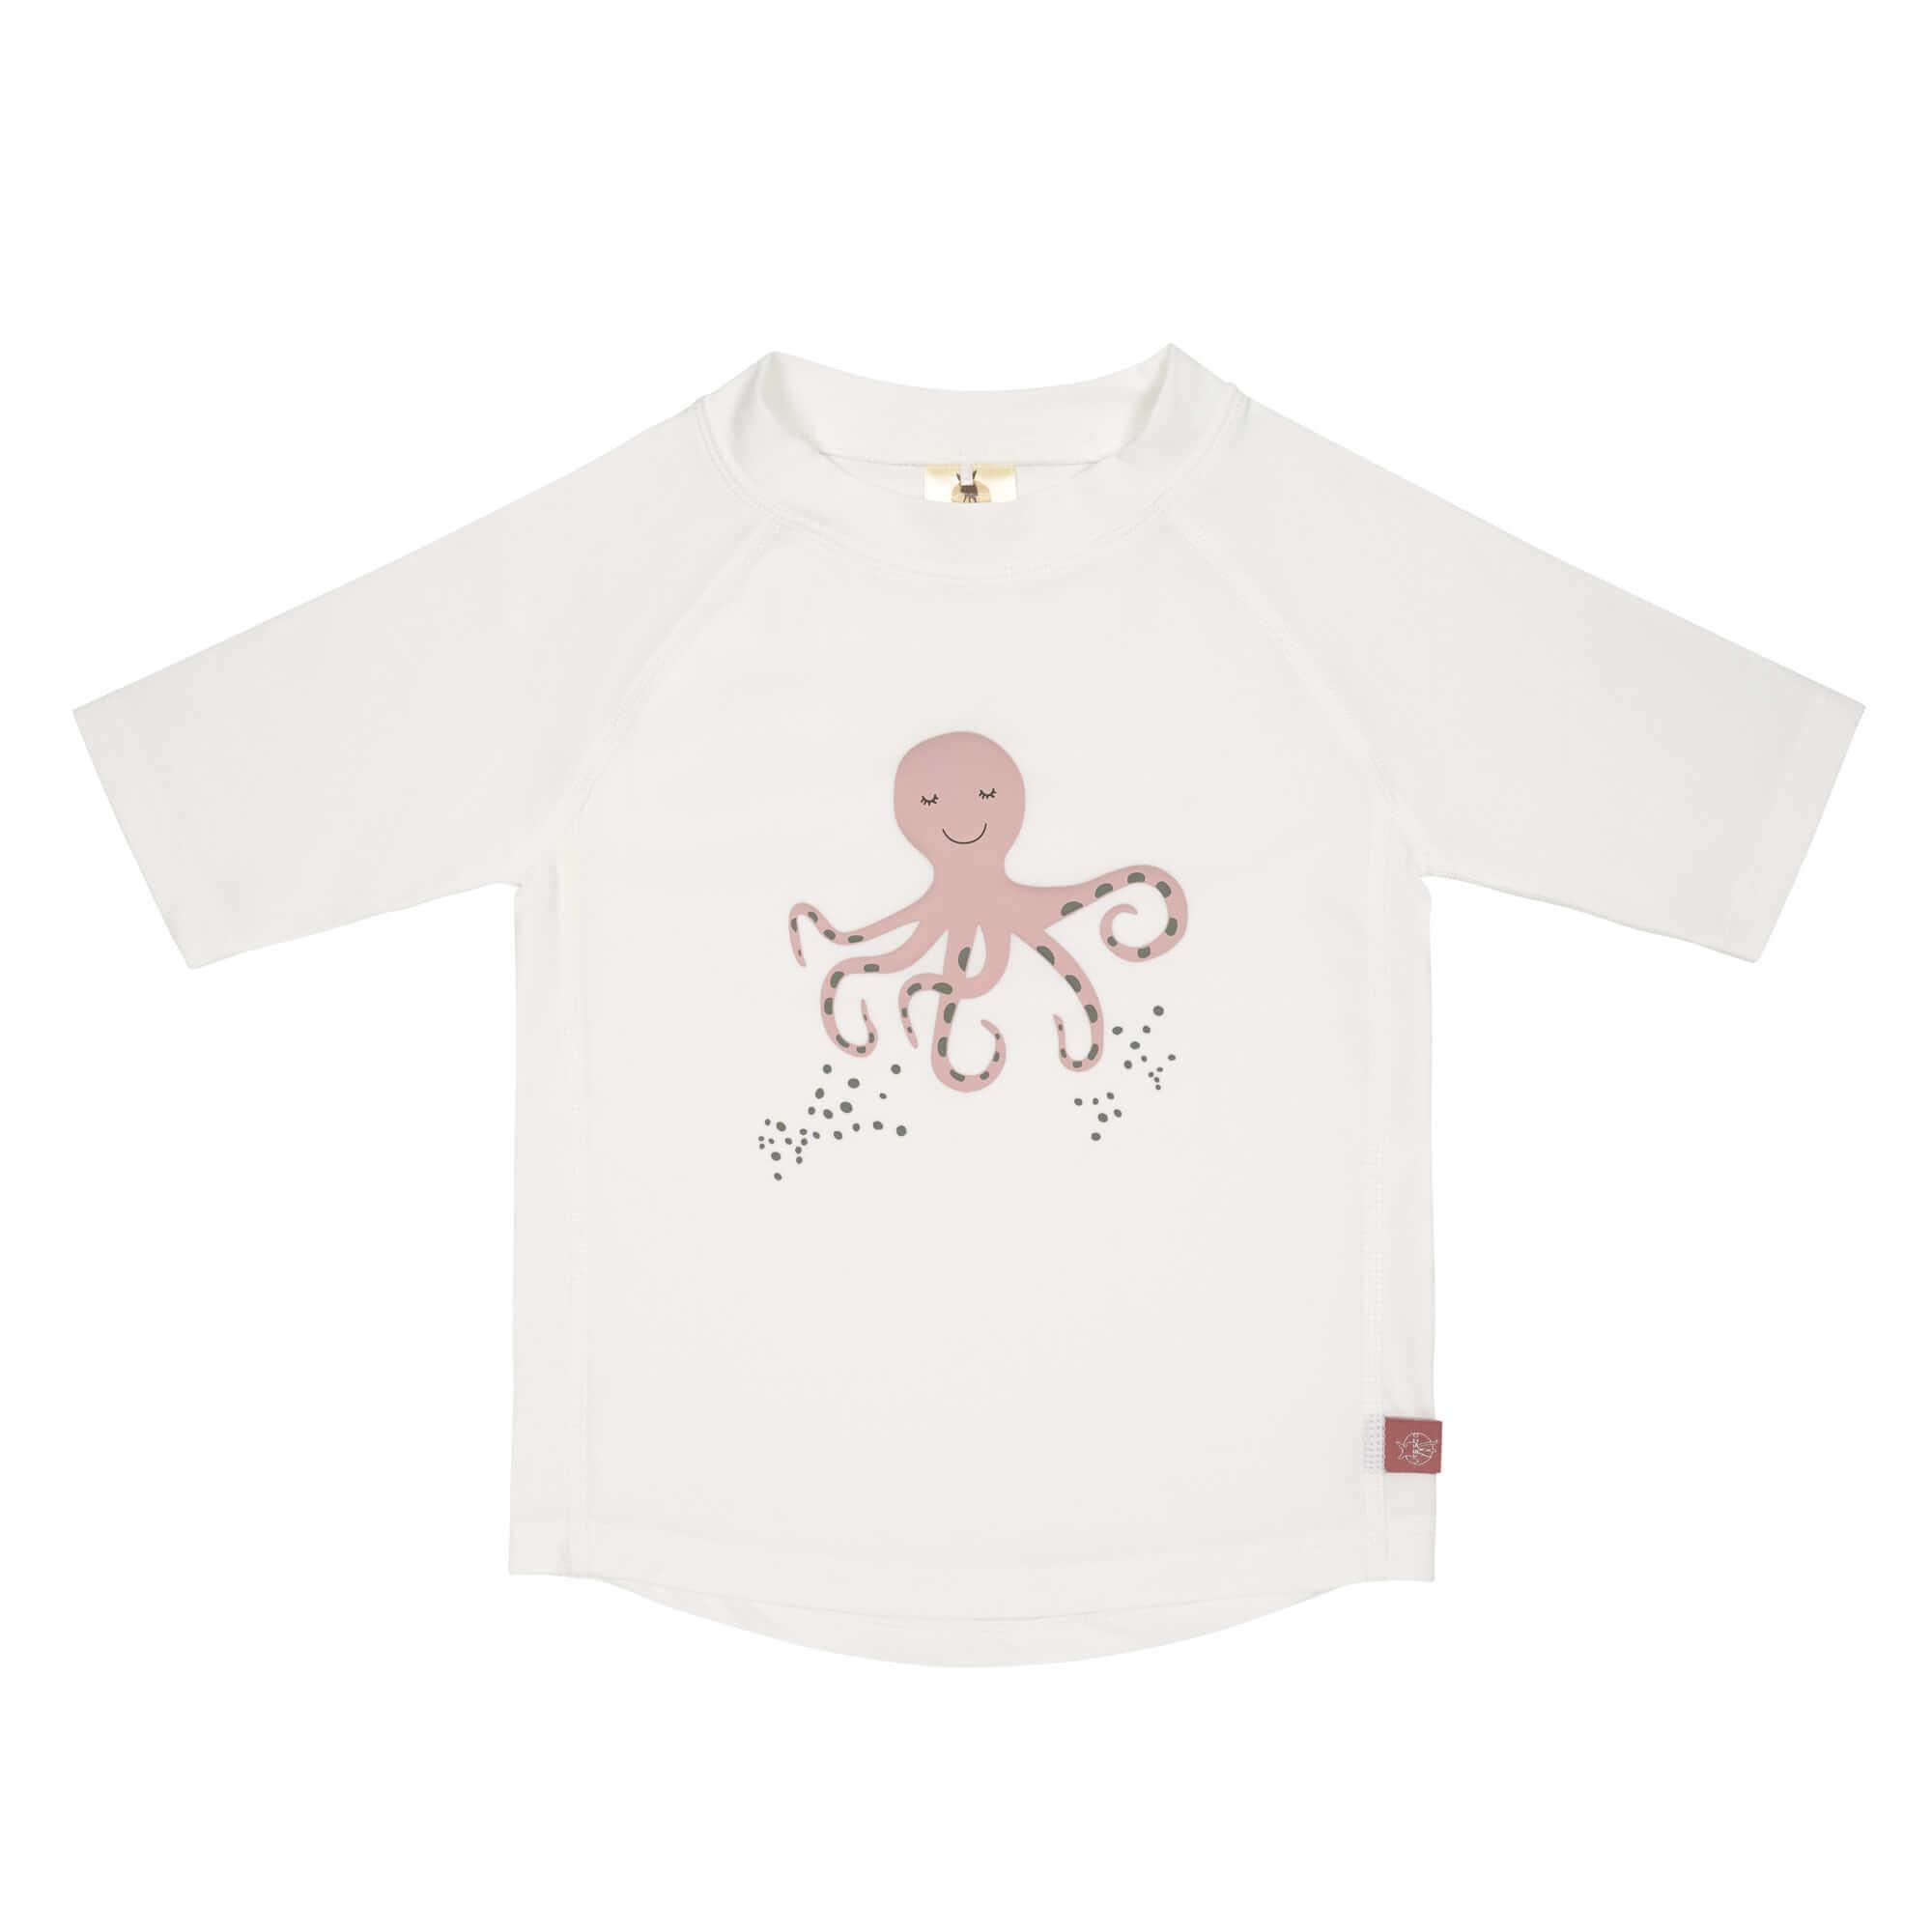 Lässig Splash & Fun Korte mouw Rashguard UV zwemshirt - Octopus white